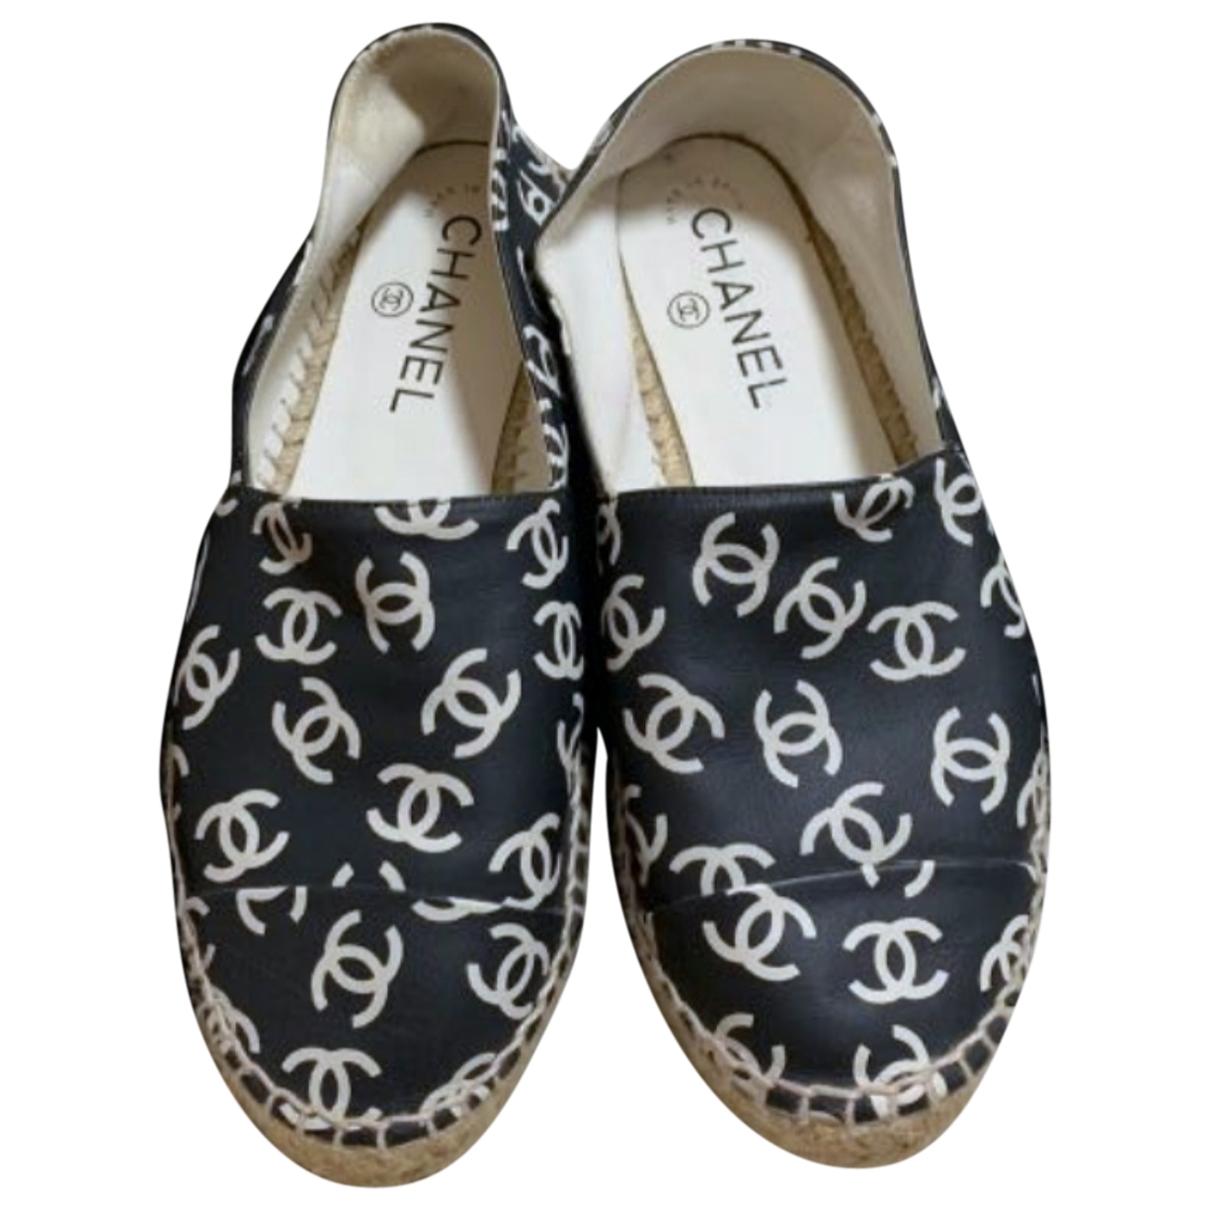 Chanel \N Black Leather Espadrilles for Women 36 EU